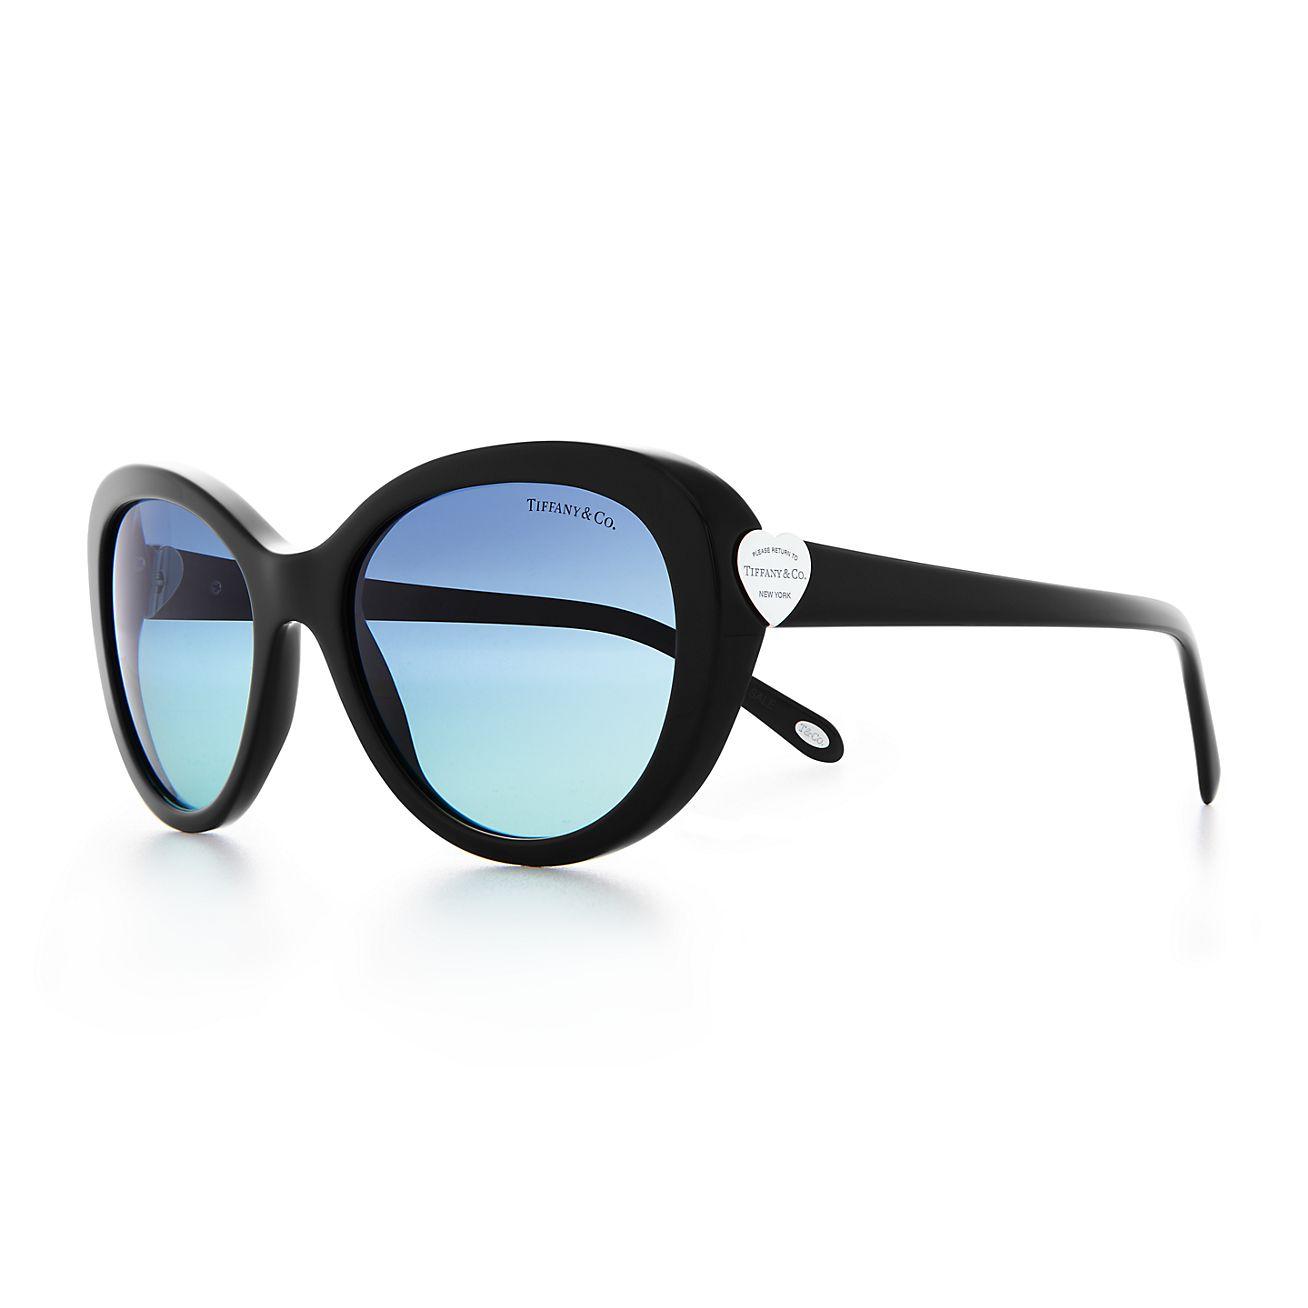 Return to Tiffany® oval sunglasses in black acetate ...